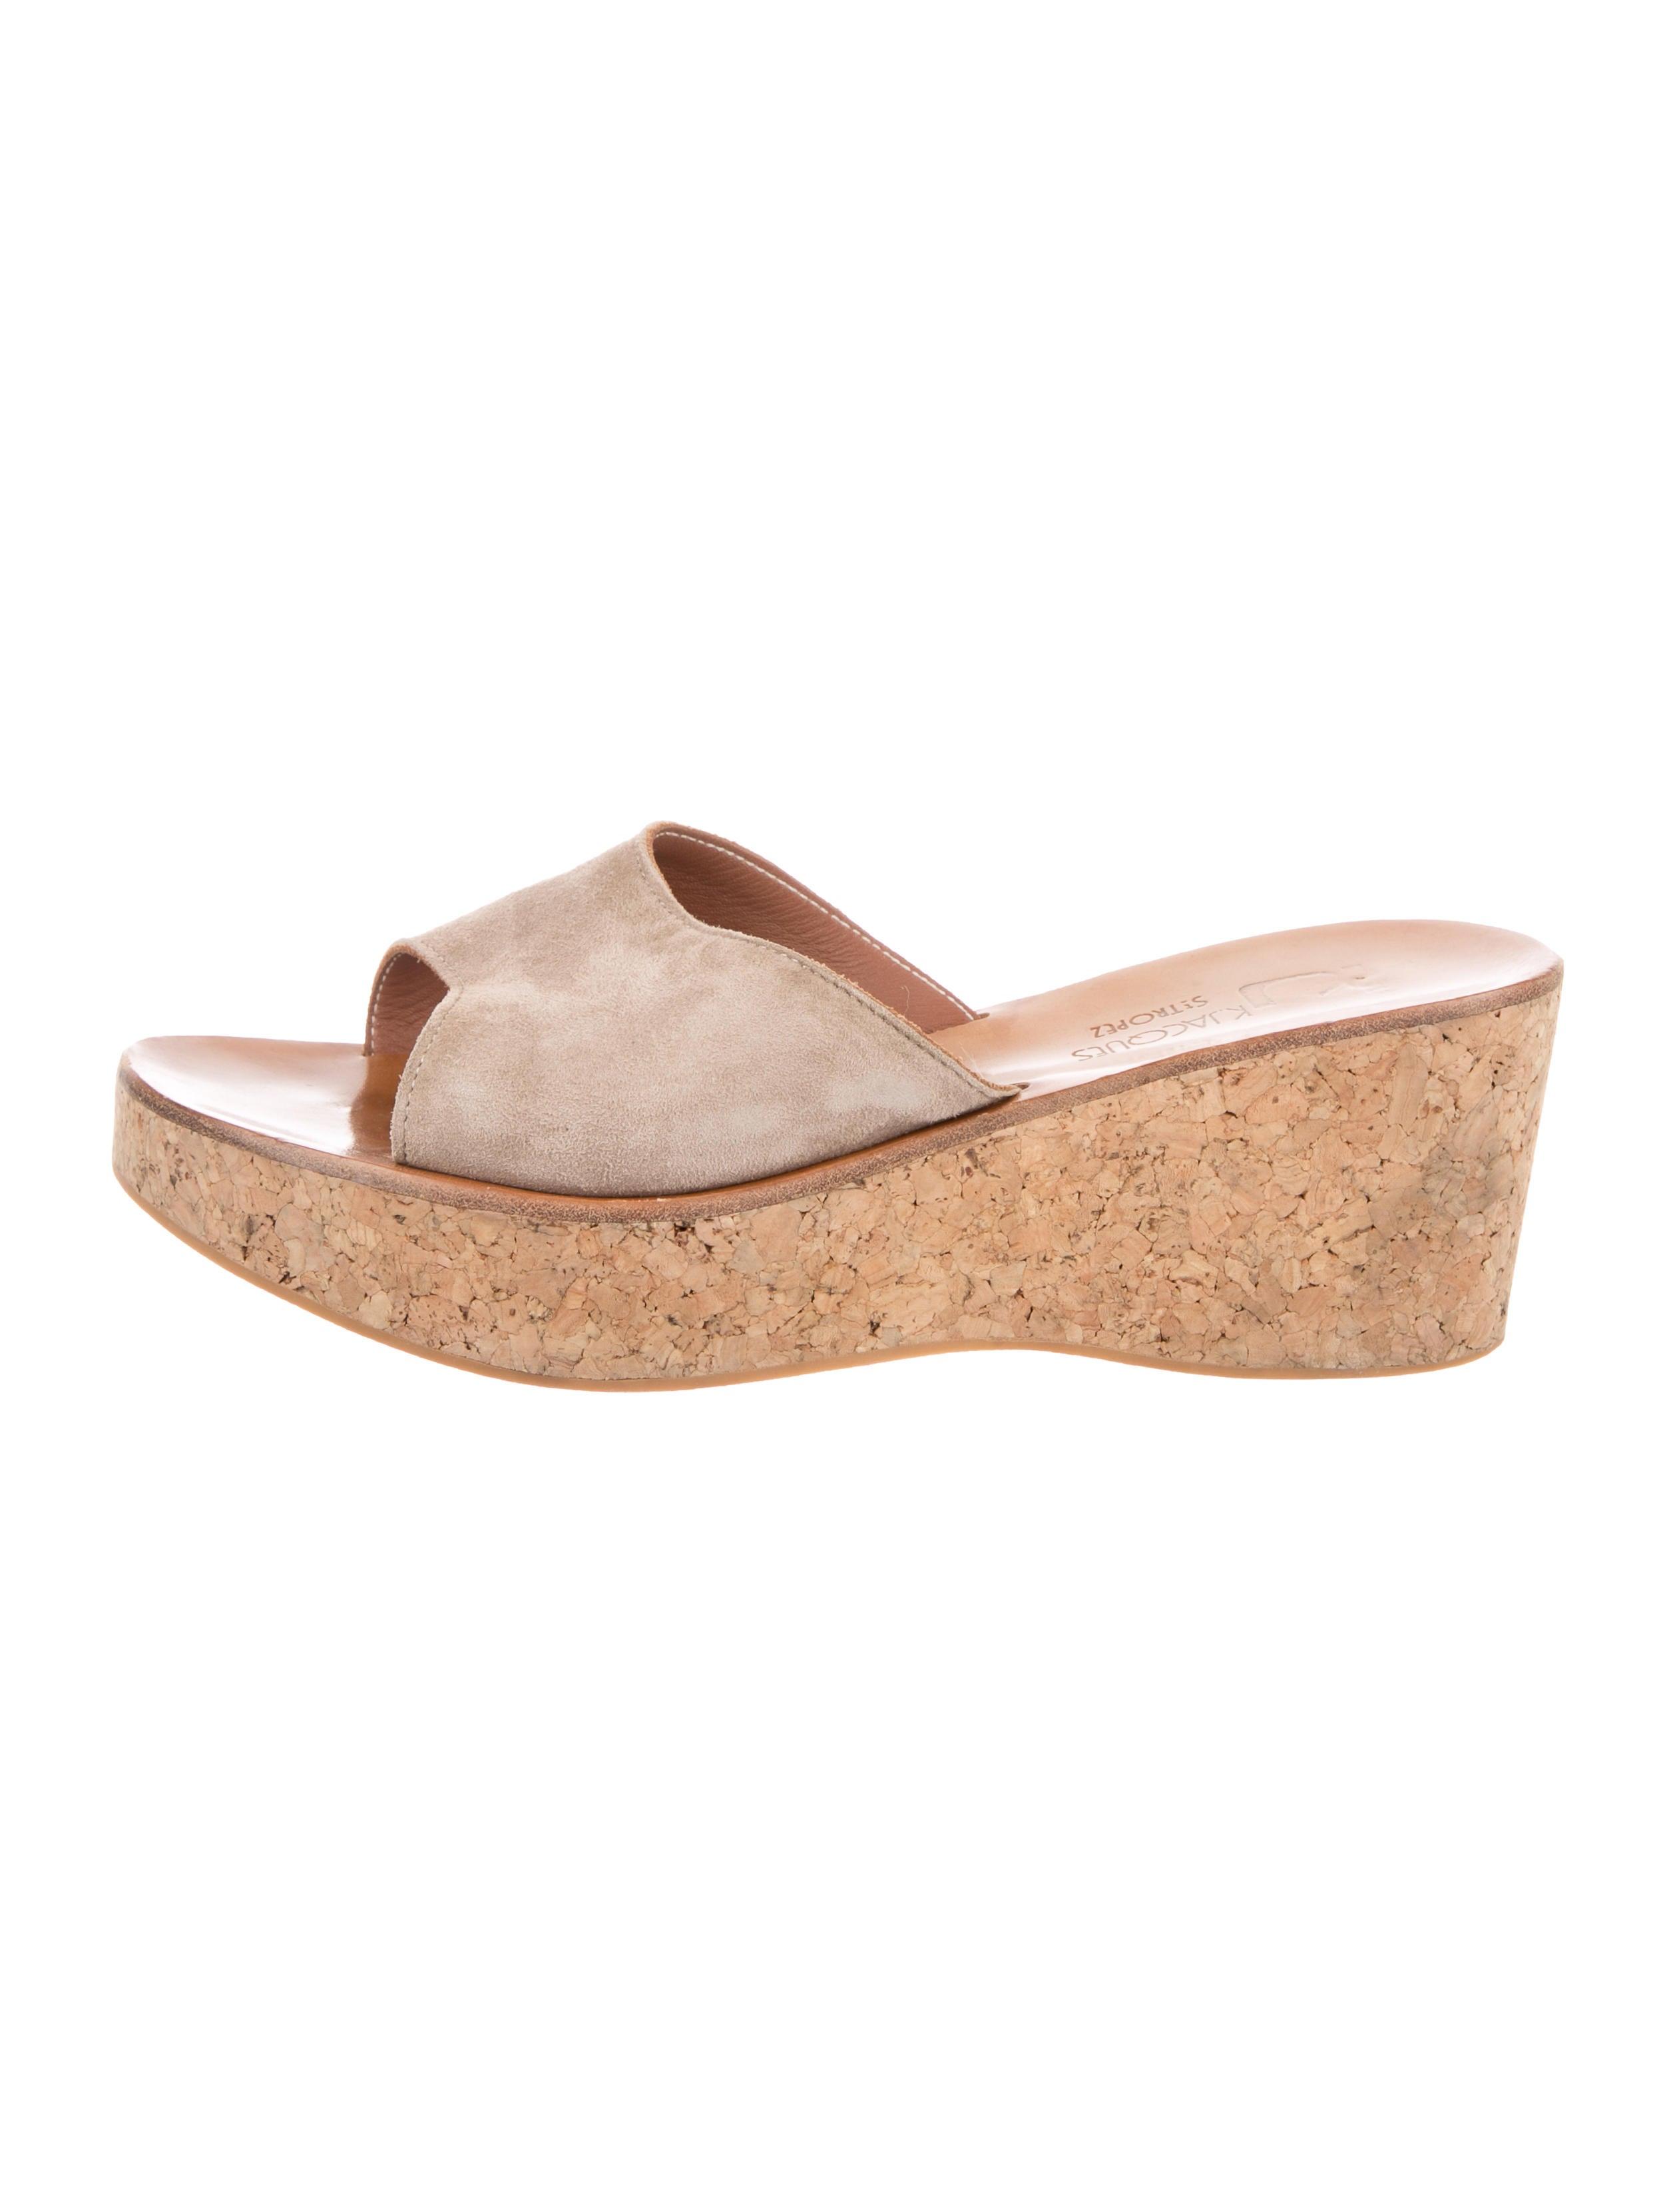 K Jacques St. Tropez Slide Wedge Sandals cheap professional tk2xQUg